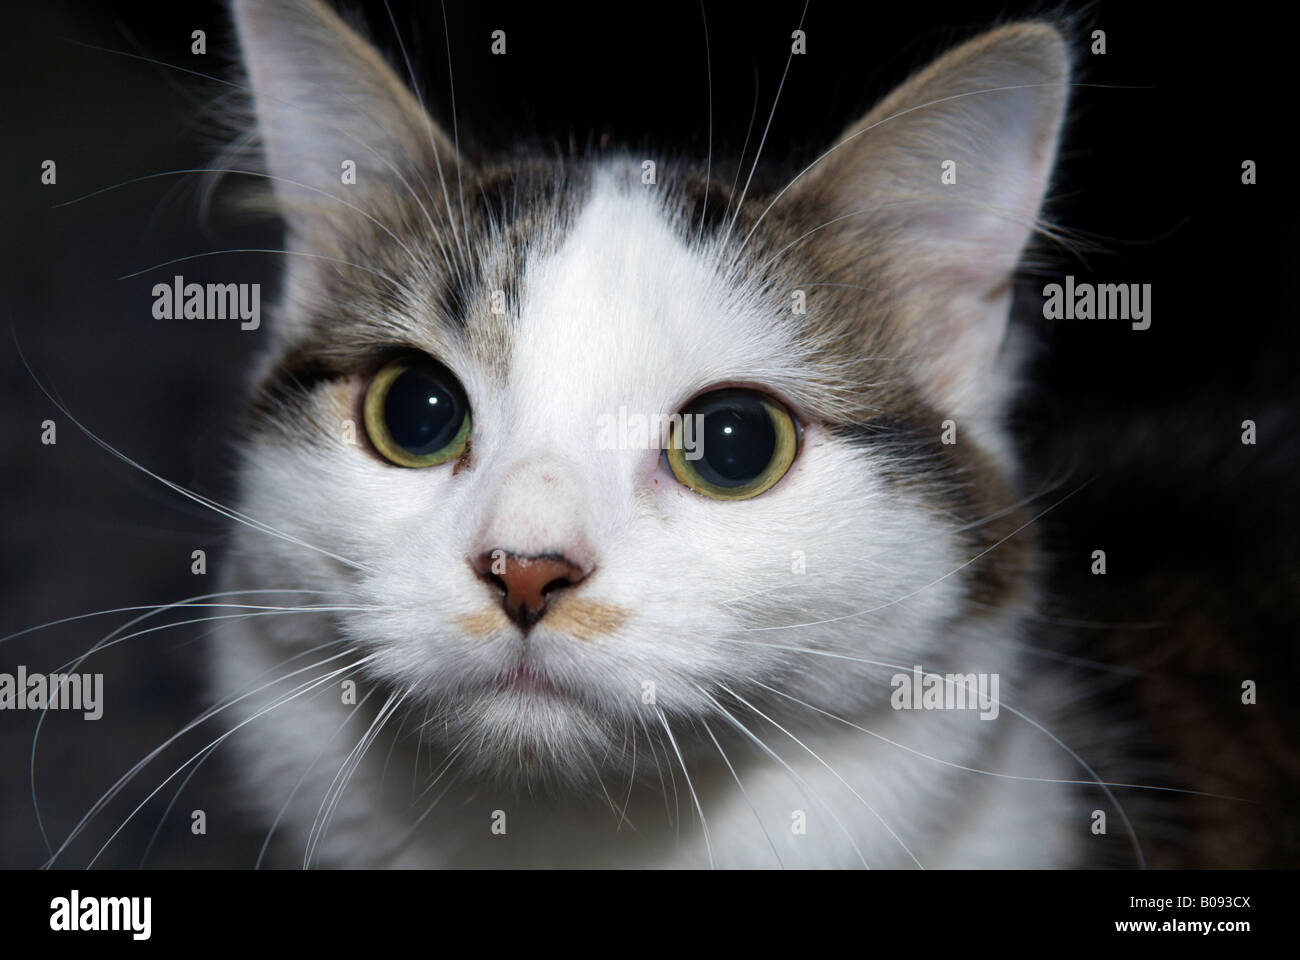 Cat With Black Markings Around Eyes